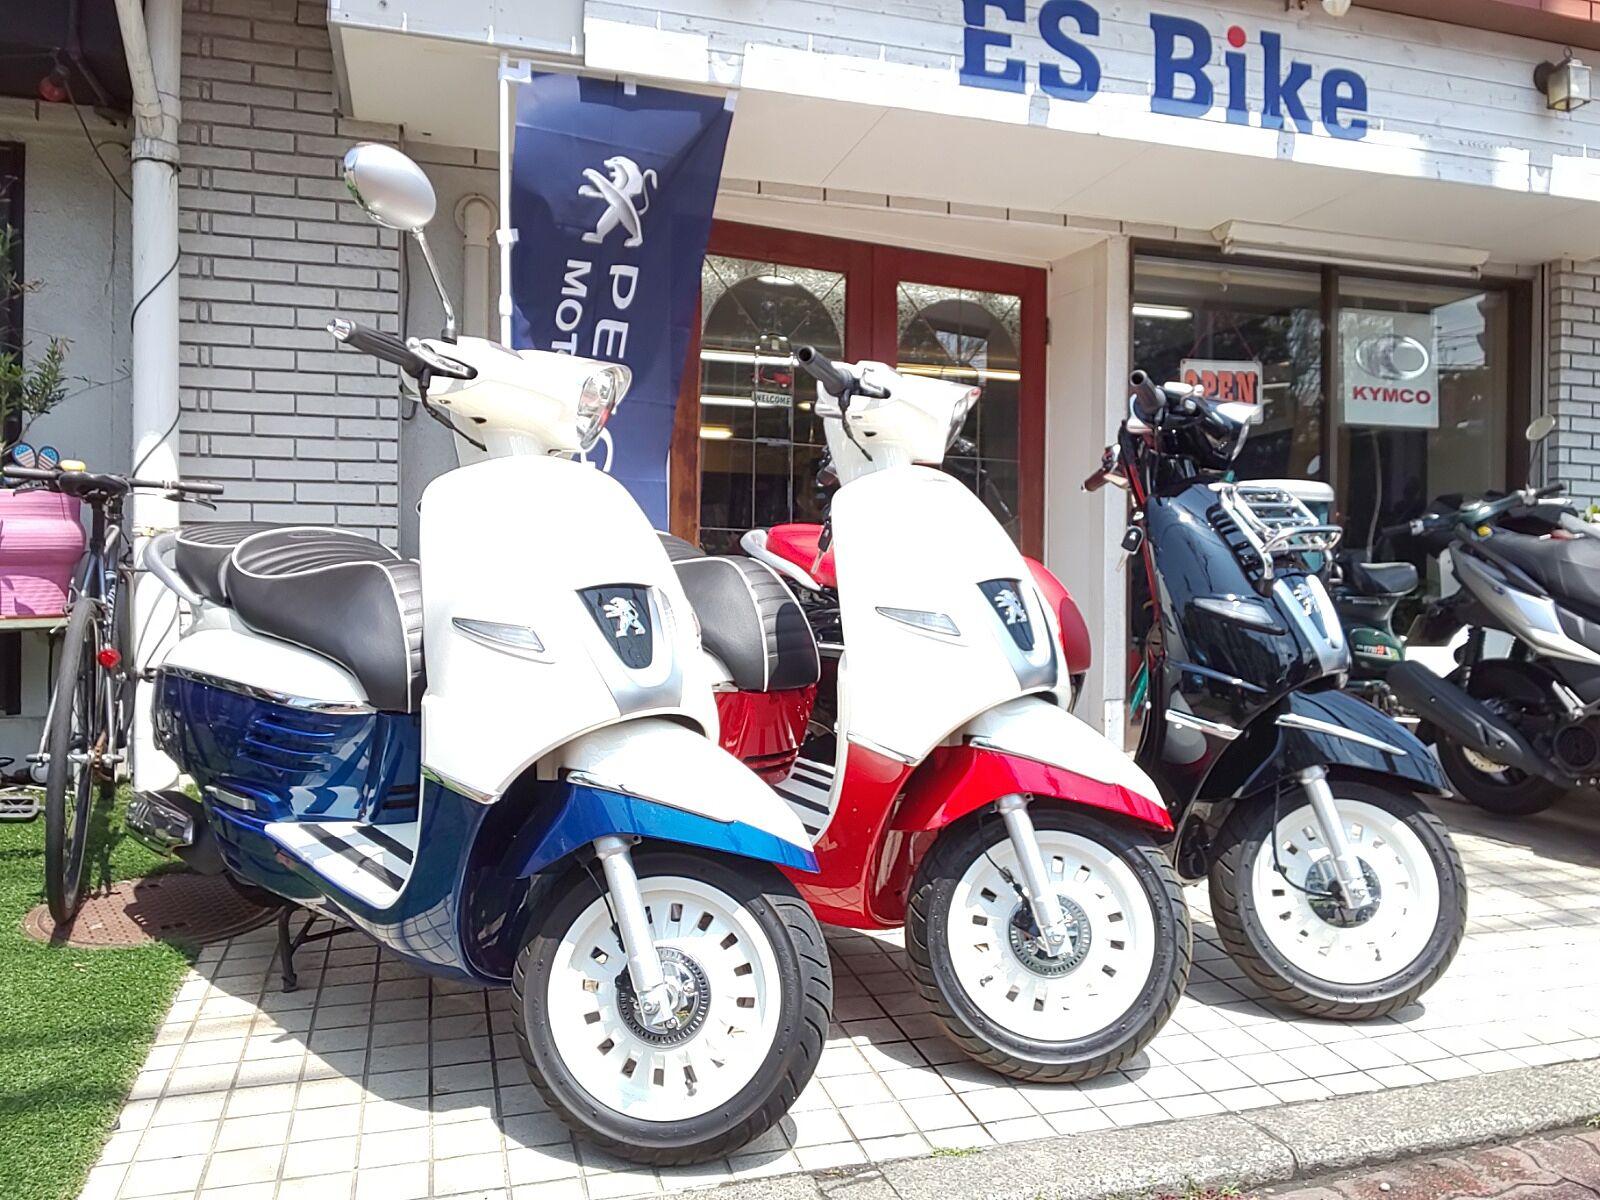 ES Bike